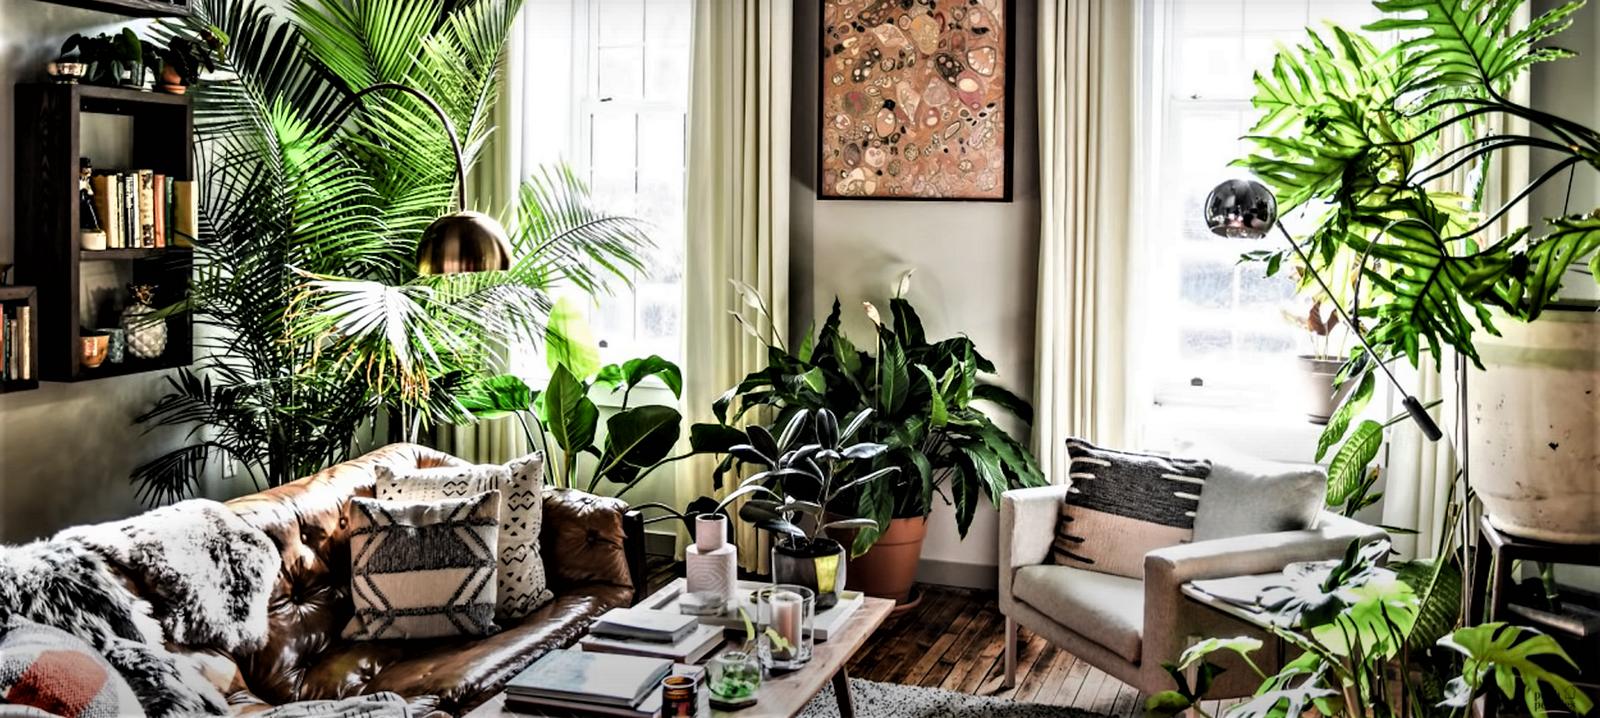 15 Tips for designing Boho Style Interiors - Sheet4